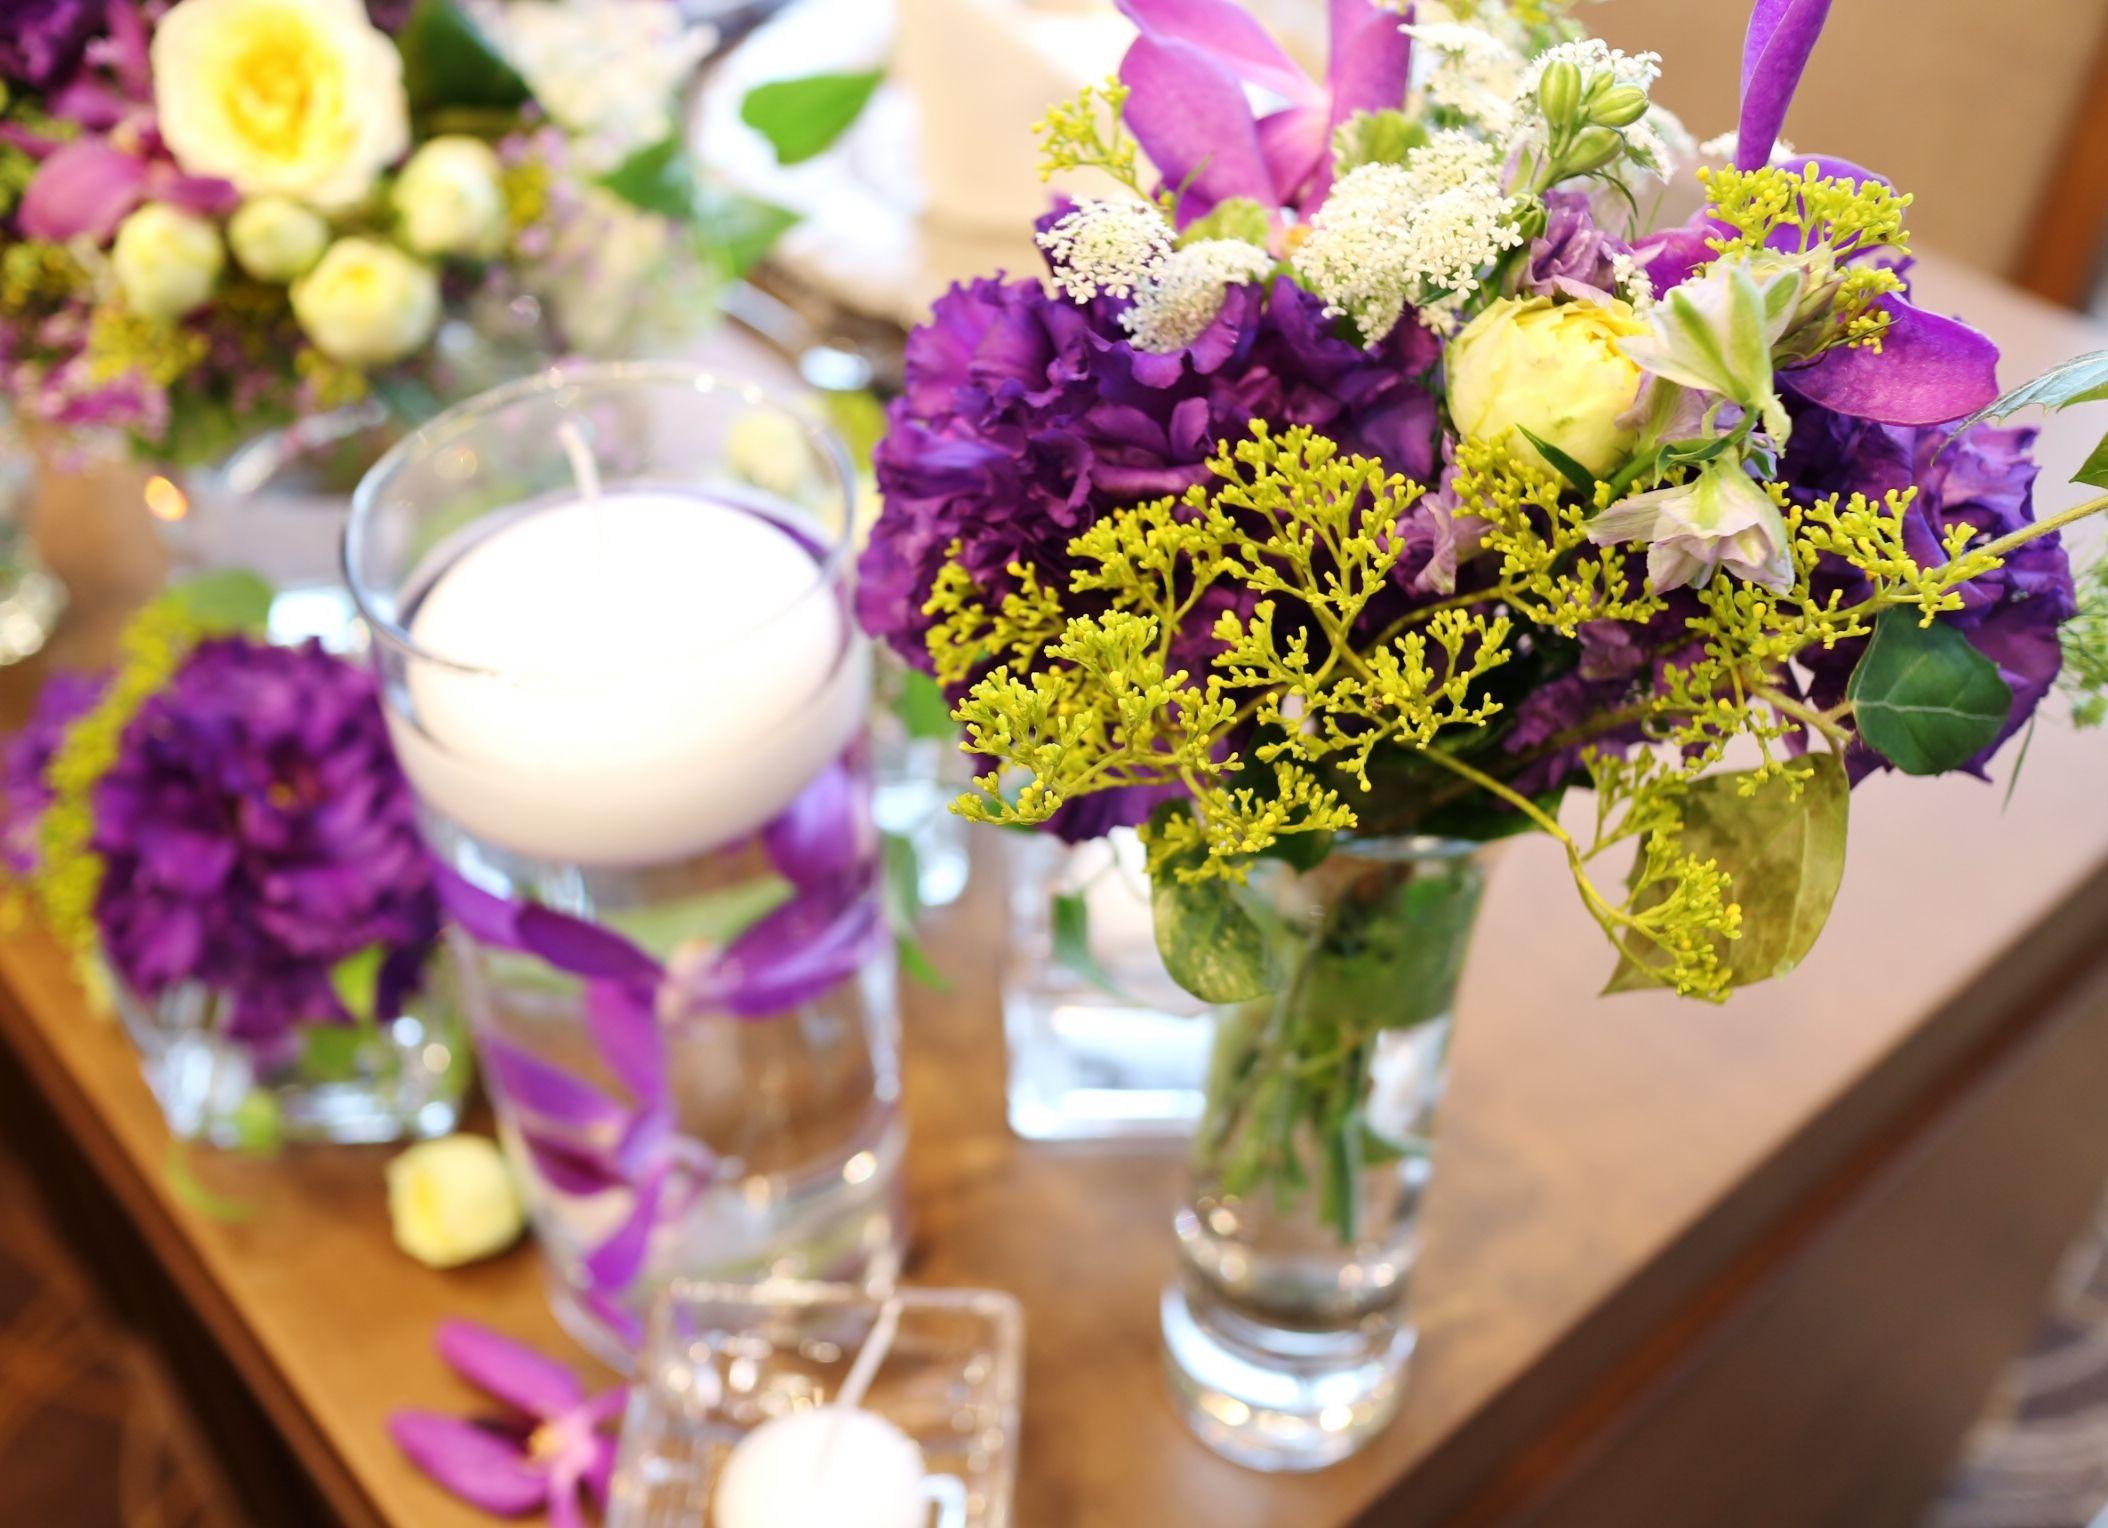 #novarese#vressetrose#koriyamamonolith# wedding #mixcolor #purple #maintable #natural #vintage # Flower # bridal #ノバレーゼ#ブレスエットロゼ#郡山モノリス#ウエディング #ミックスカラー#メインテーブル#ナチュラル#花 #ブライダル#結婚式#ブレスエットロゼ郡山#水中花#パープル#キャンドル